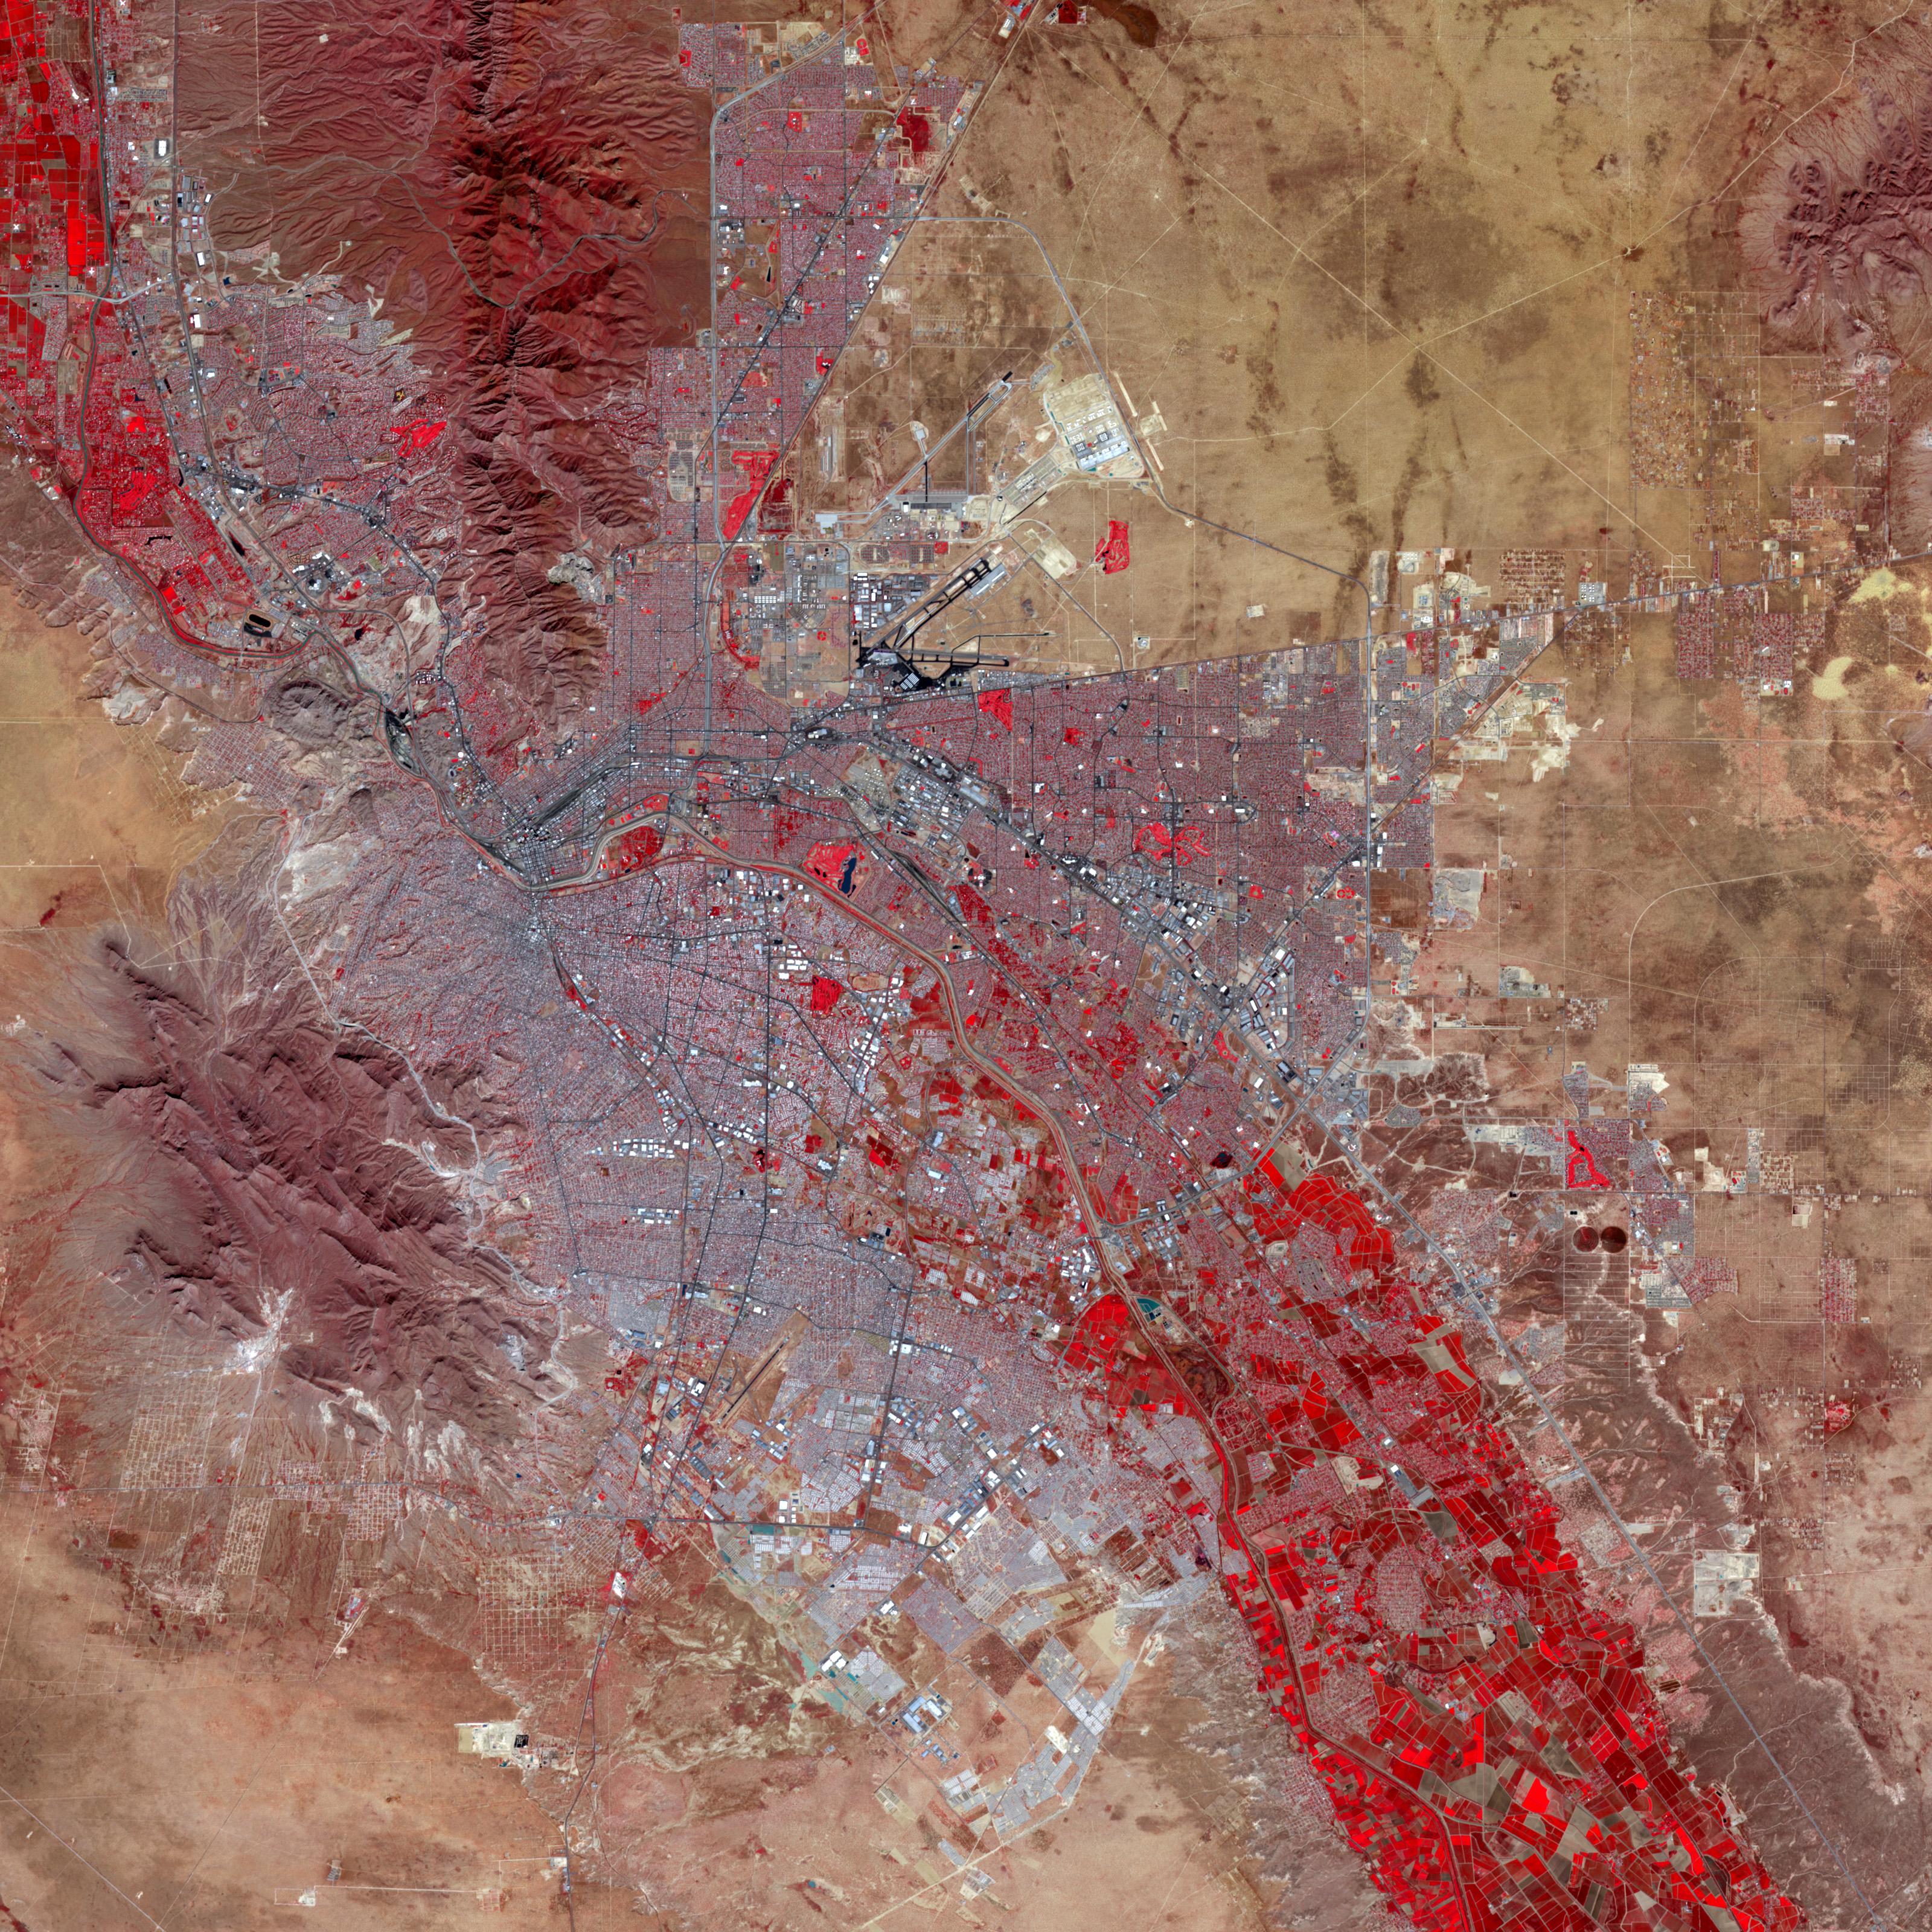 El Paso Texas and Ciudad Juarez Mexico False Color with Red Vegetation